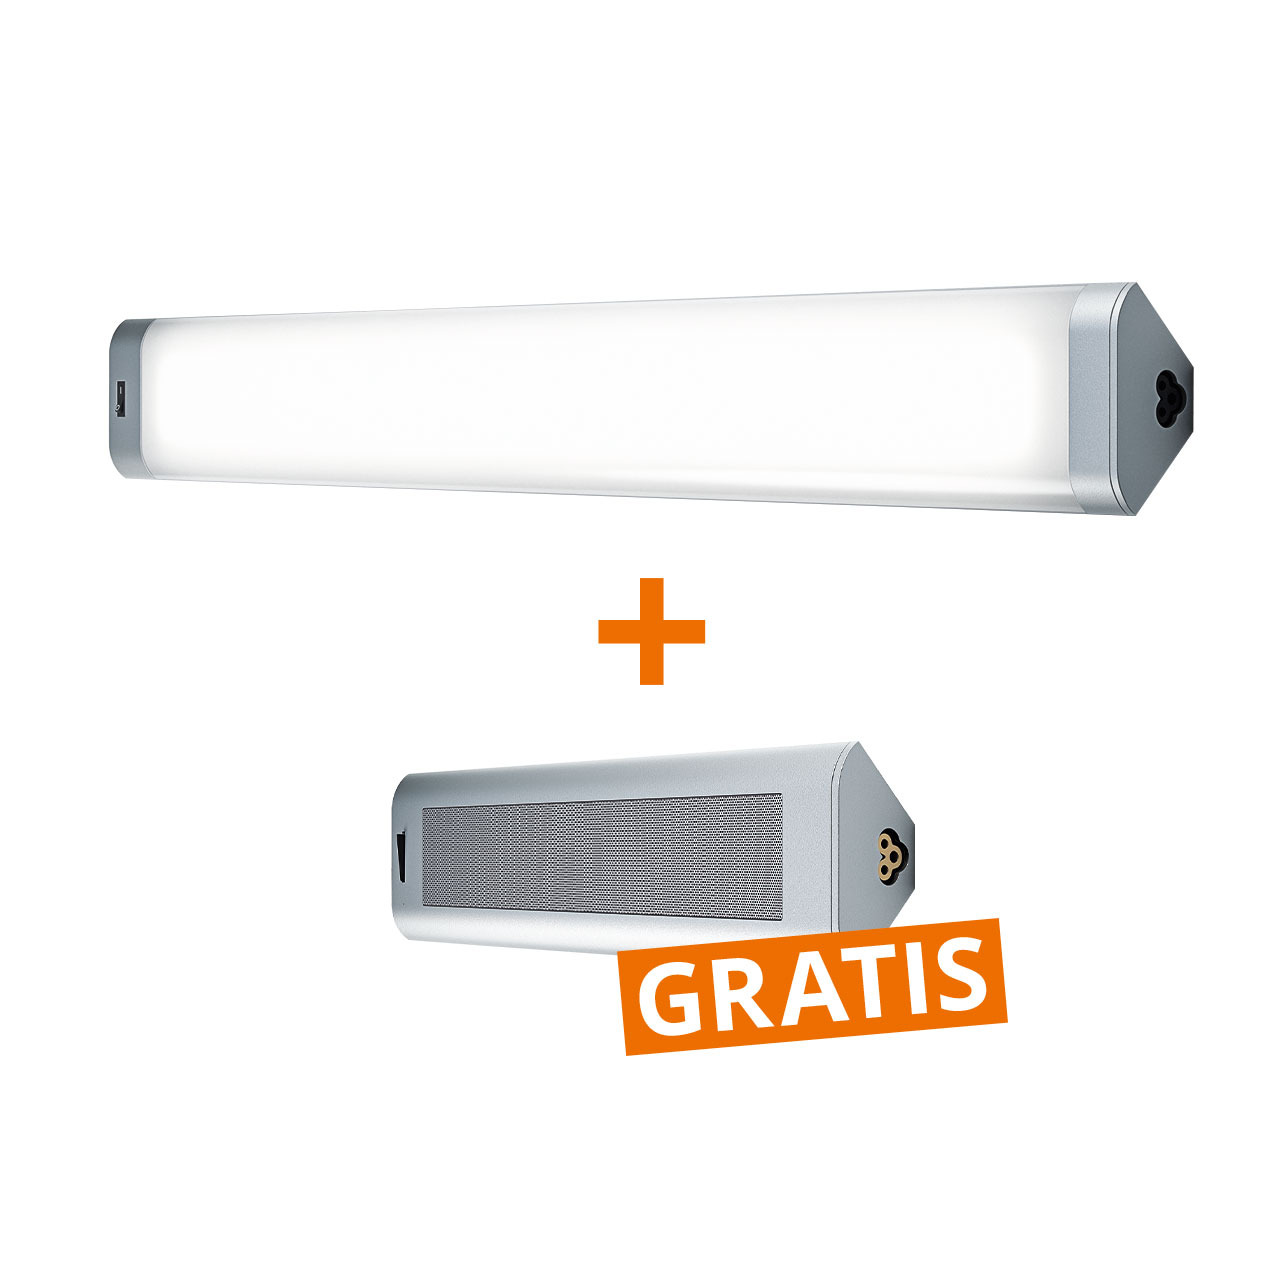 OSRAM 18-W-LED-Unterbauleuchte- 80 cm- warmweiss